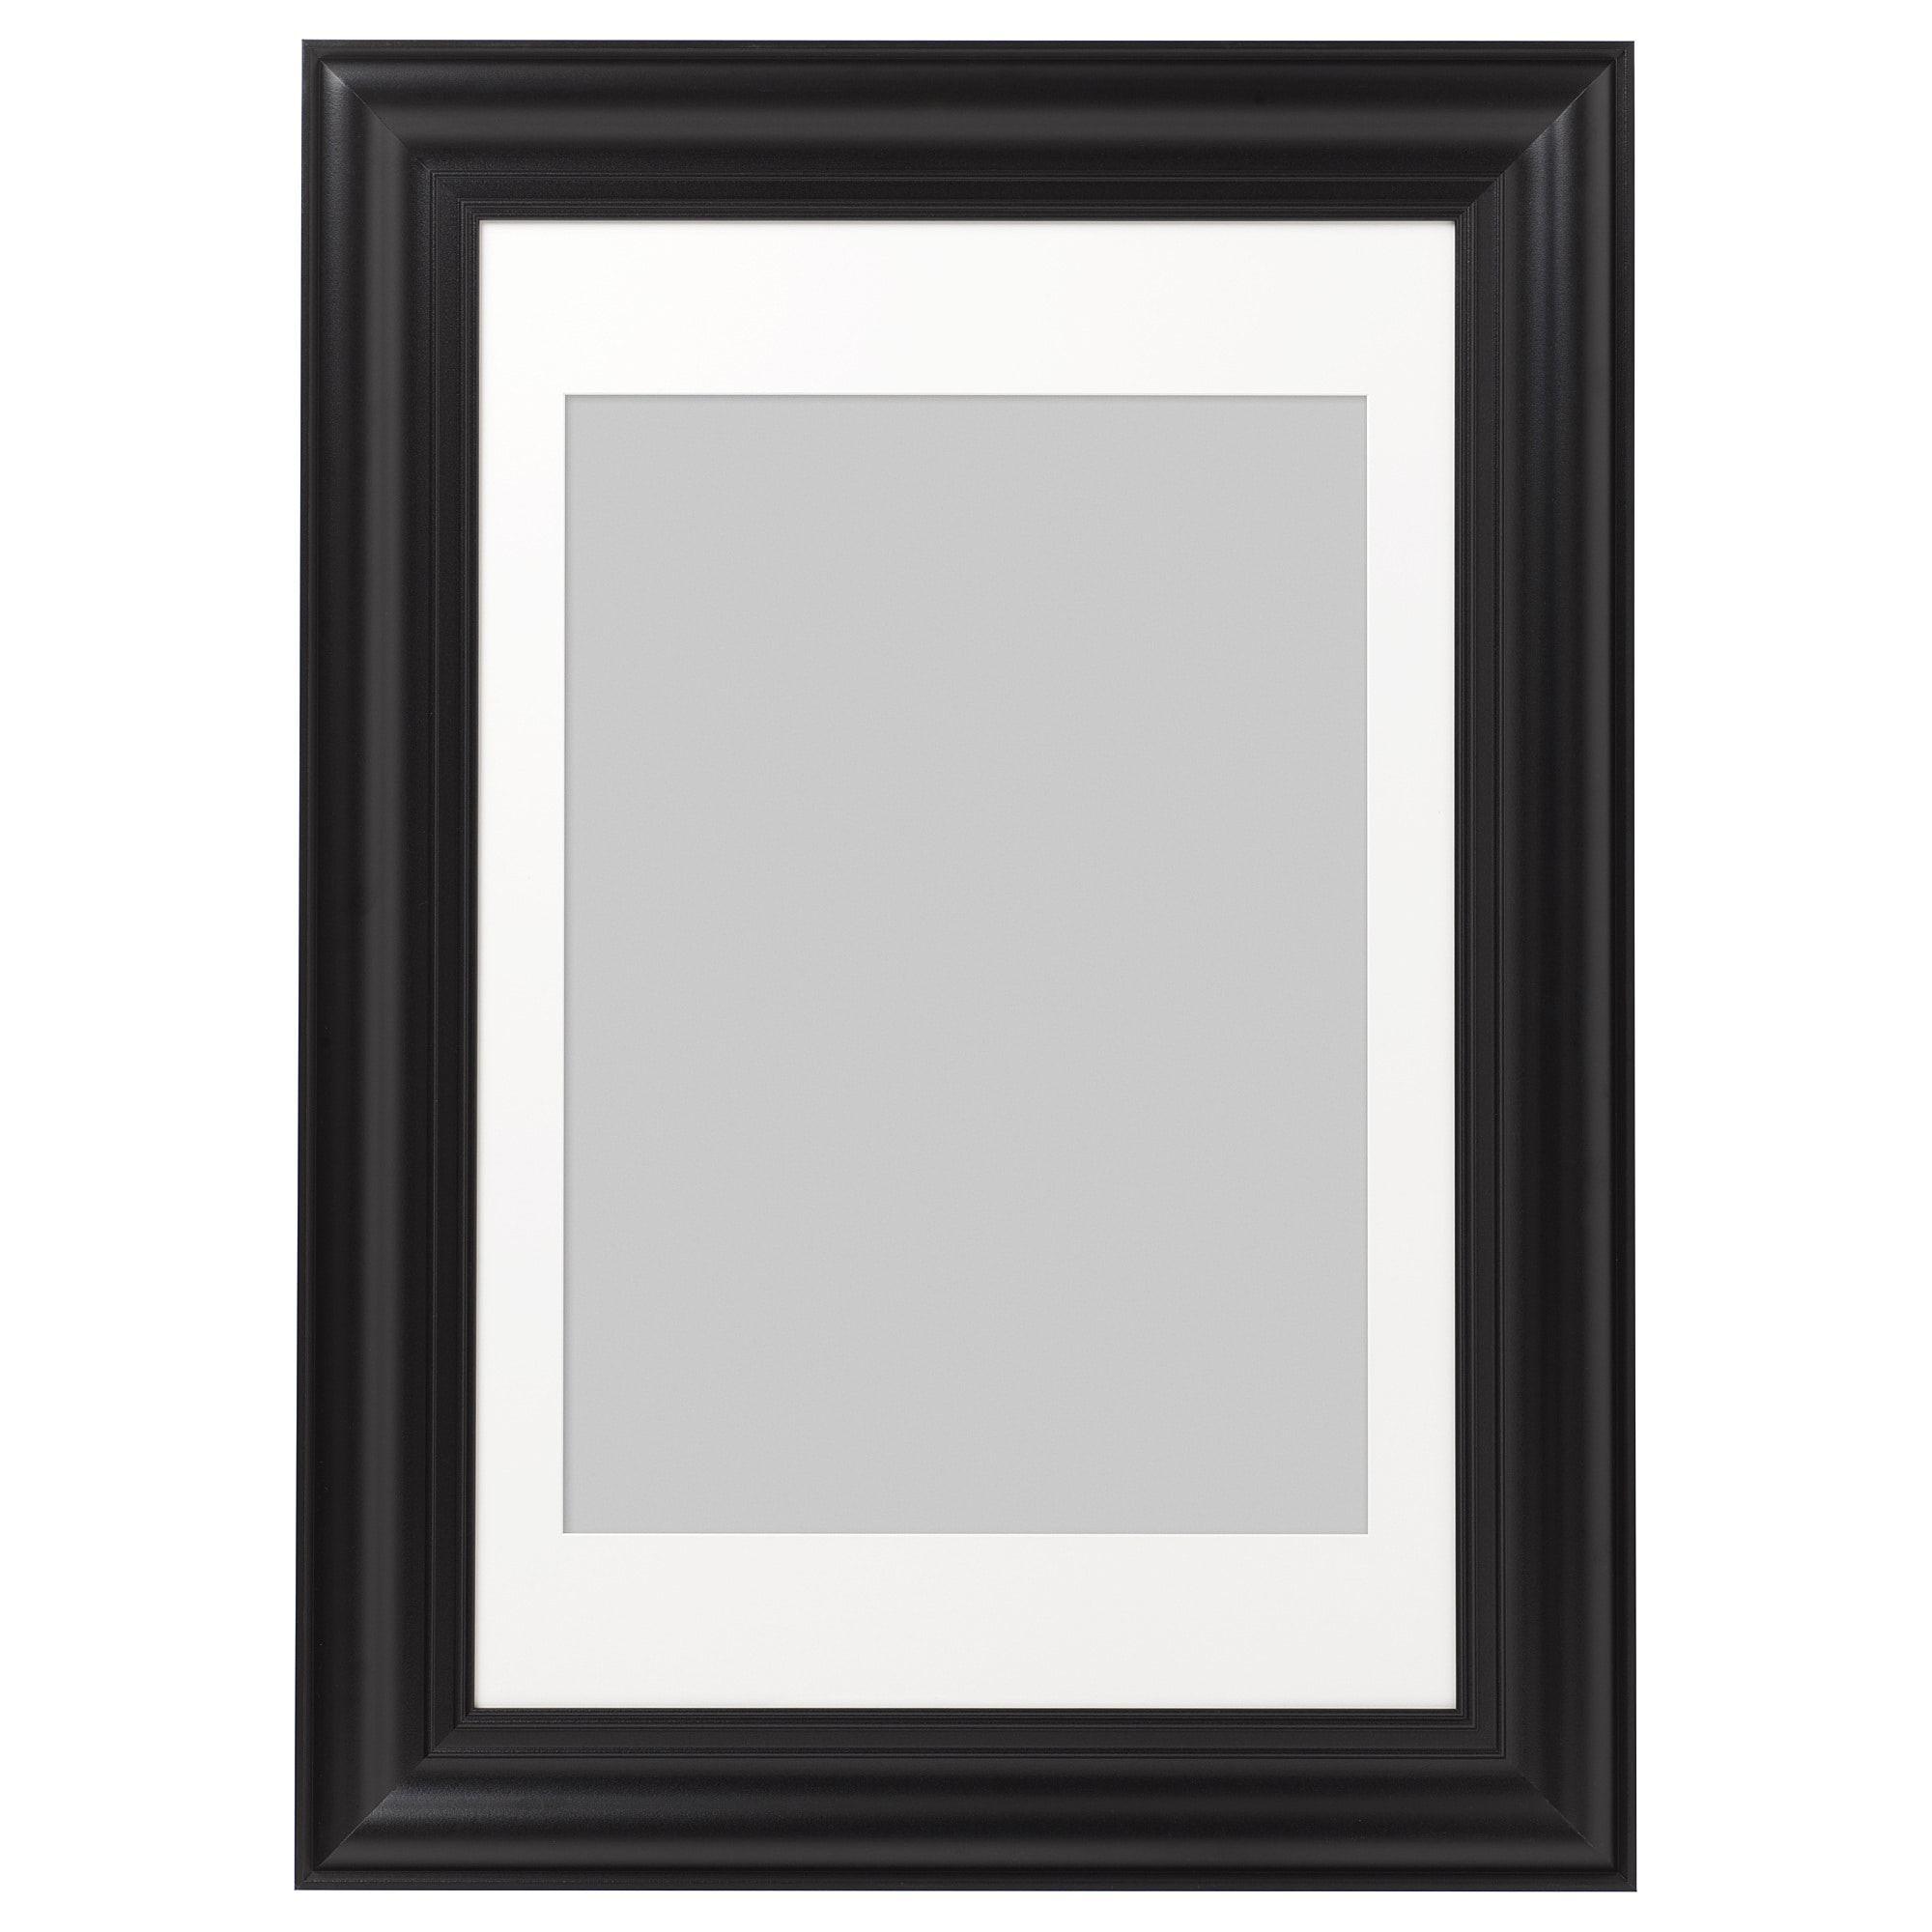 Skatteby Cadre Noir 61x91 Cm Ikea Frame Antique Stain Picture Frames